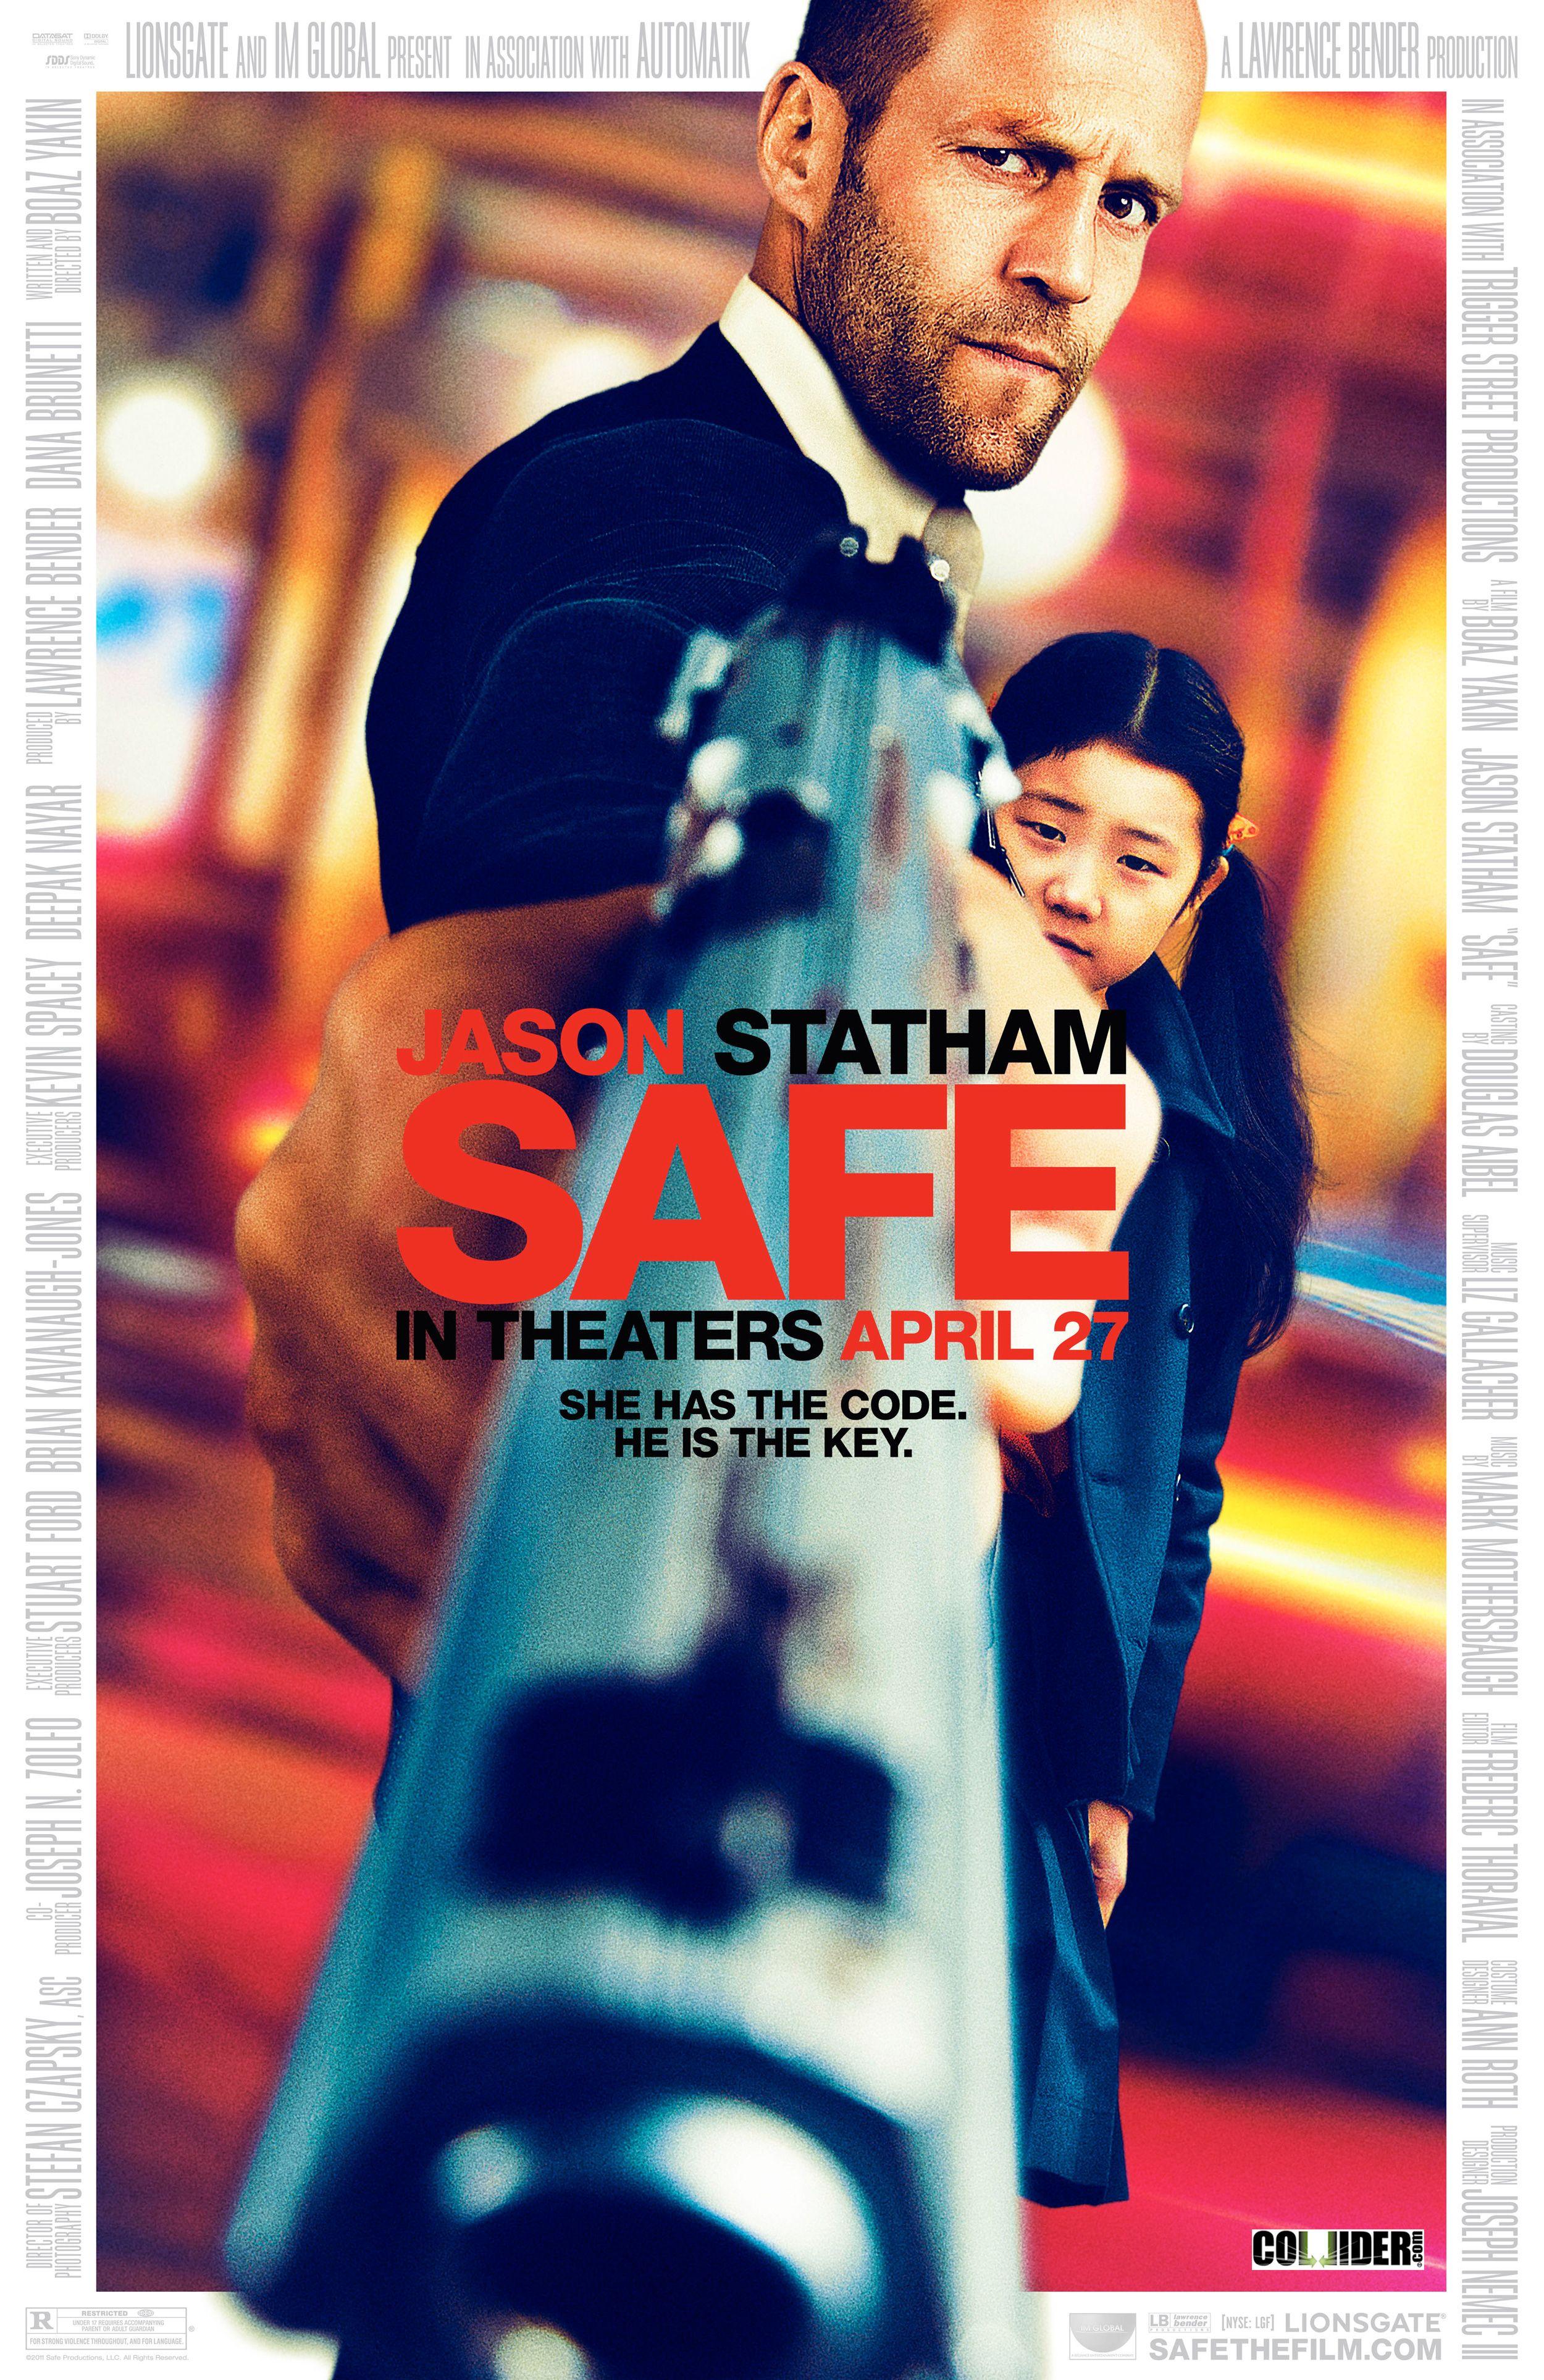 Safe Movie poster. Staring Jason Statham | Jason statham movies, New movie  posters, Statham